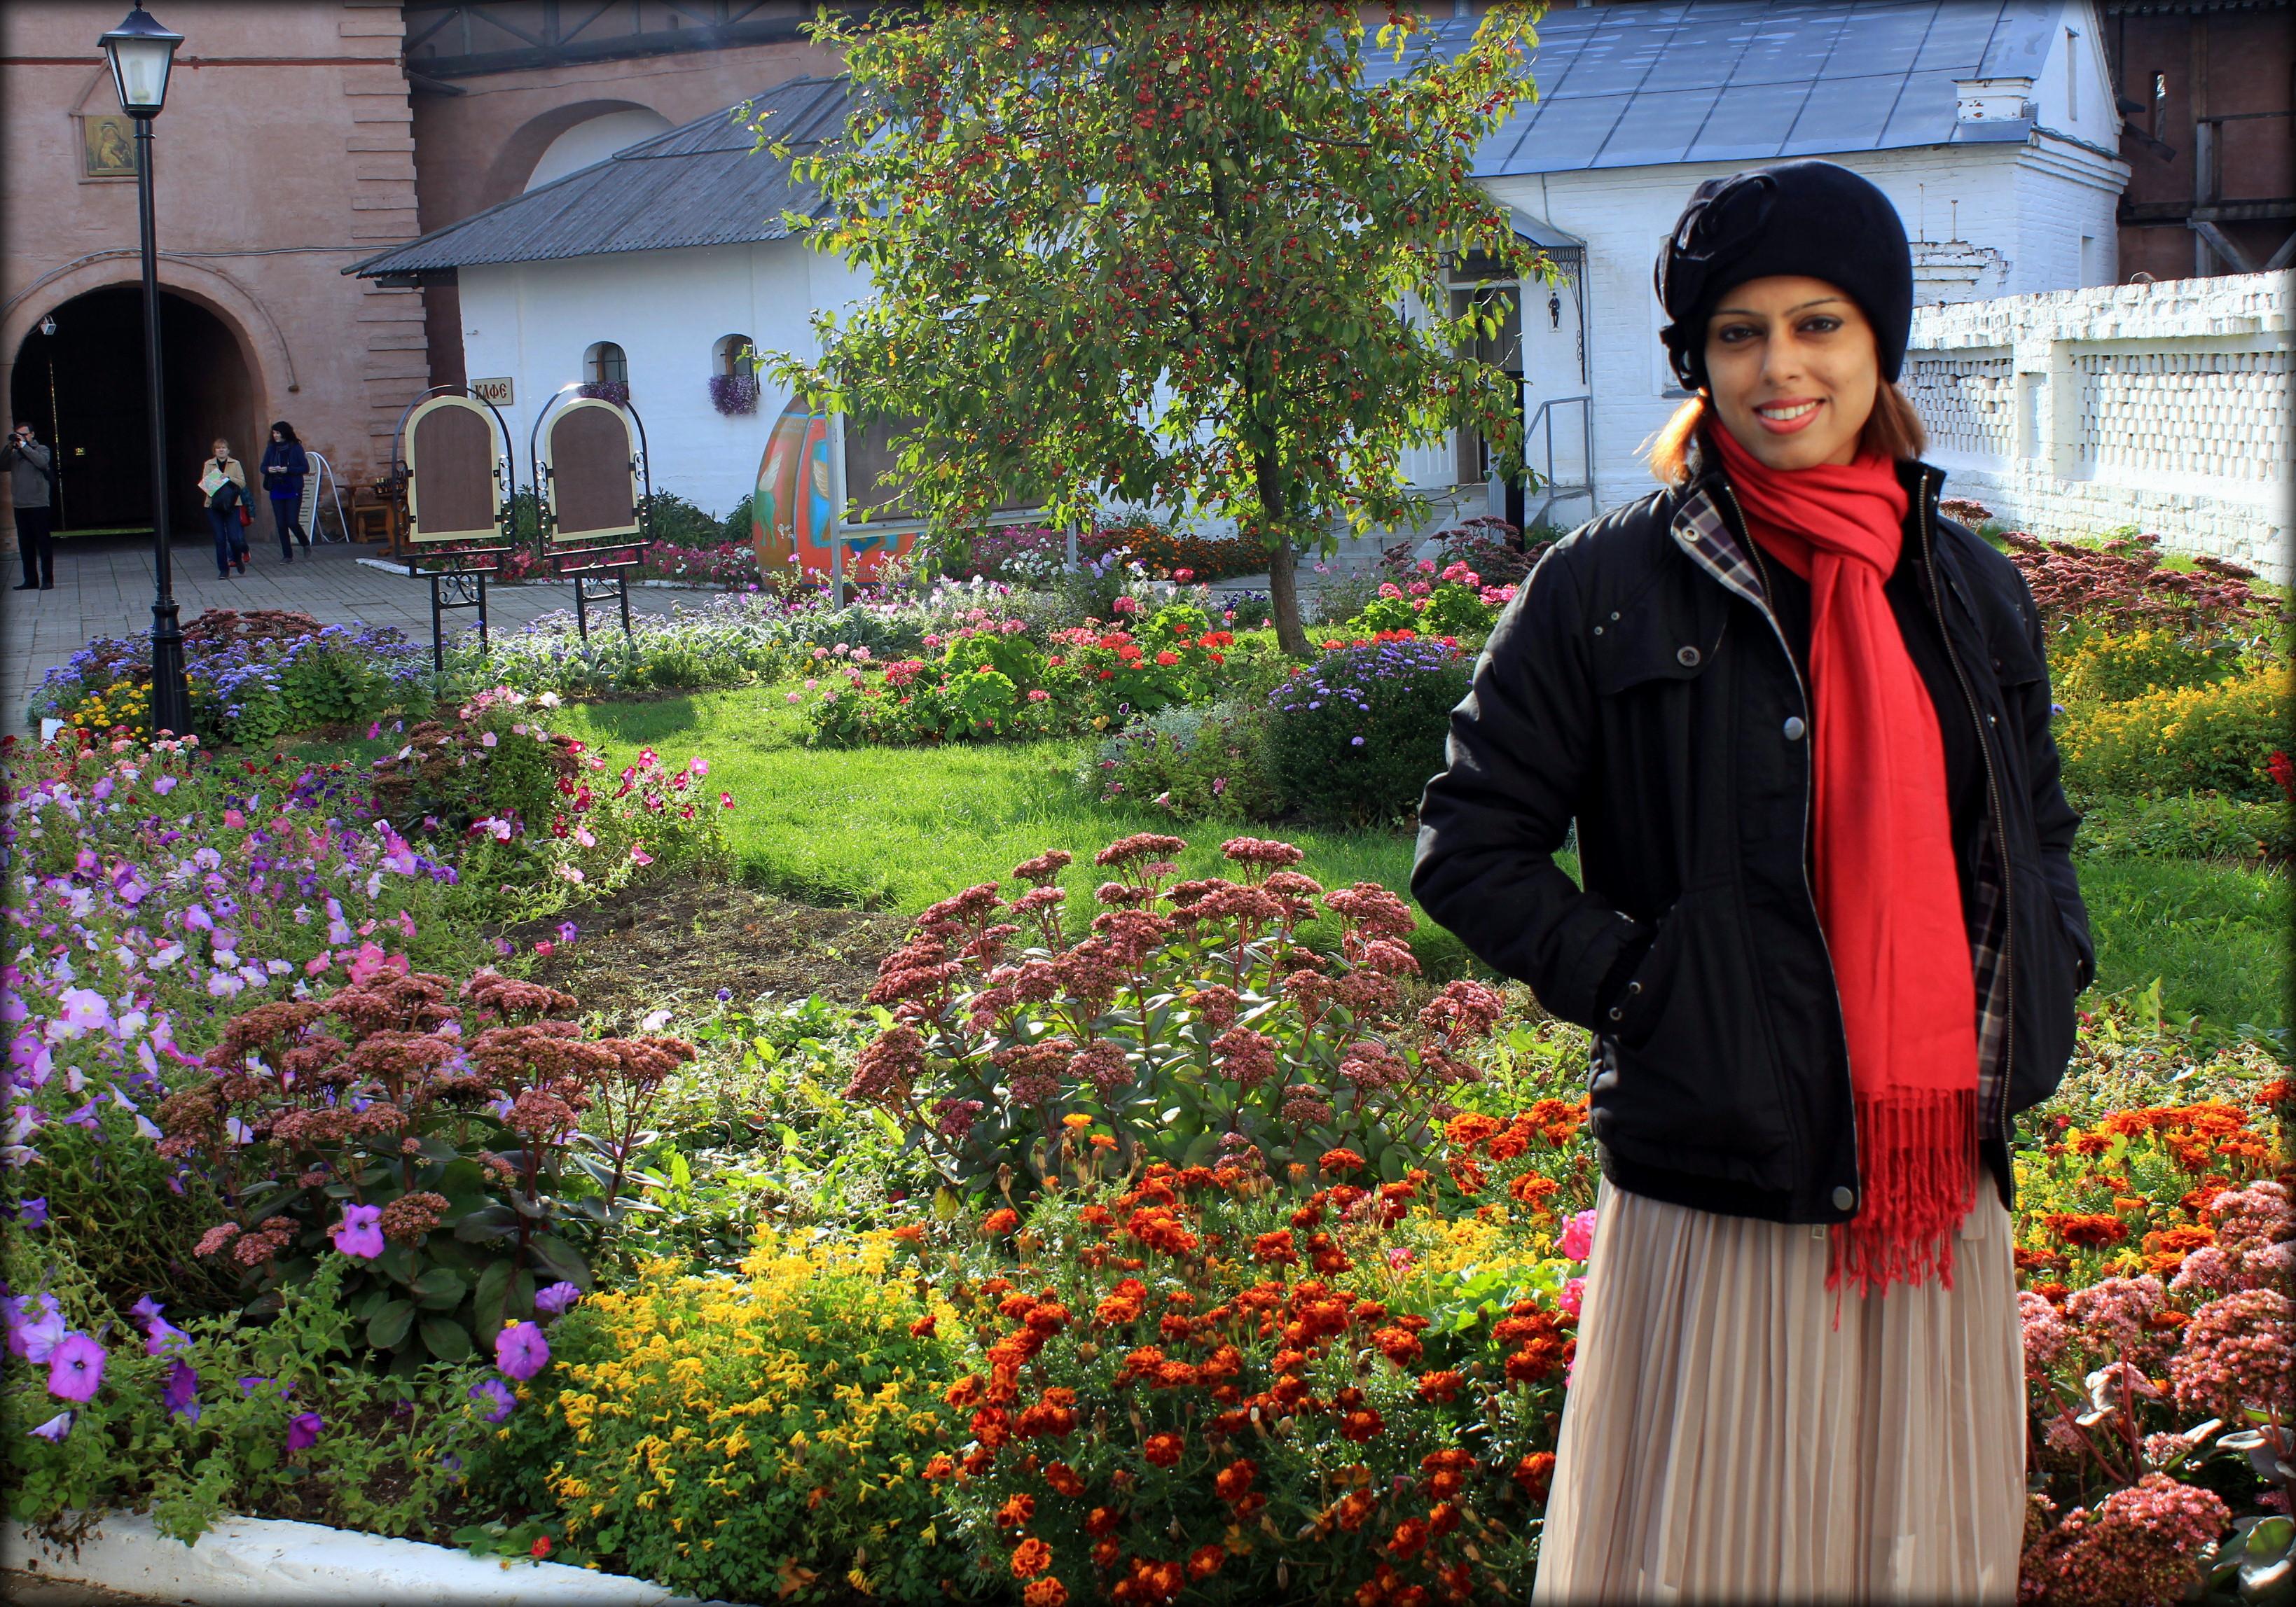 #Russia #Suzdal #travelblog #maverickbird